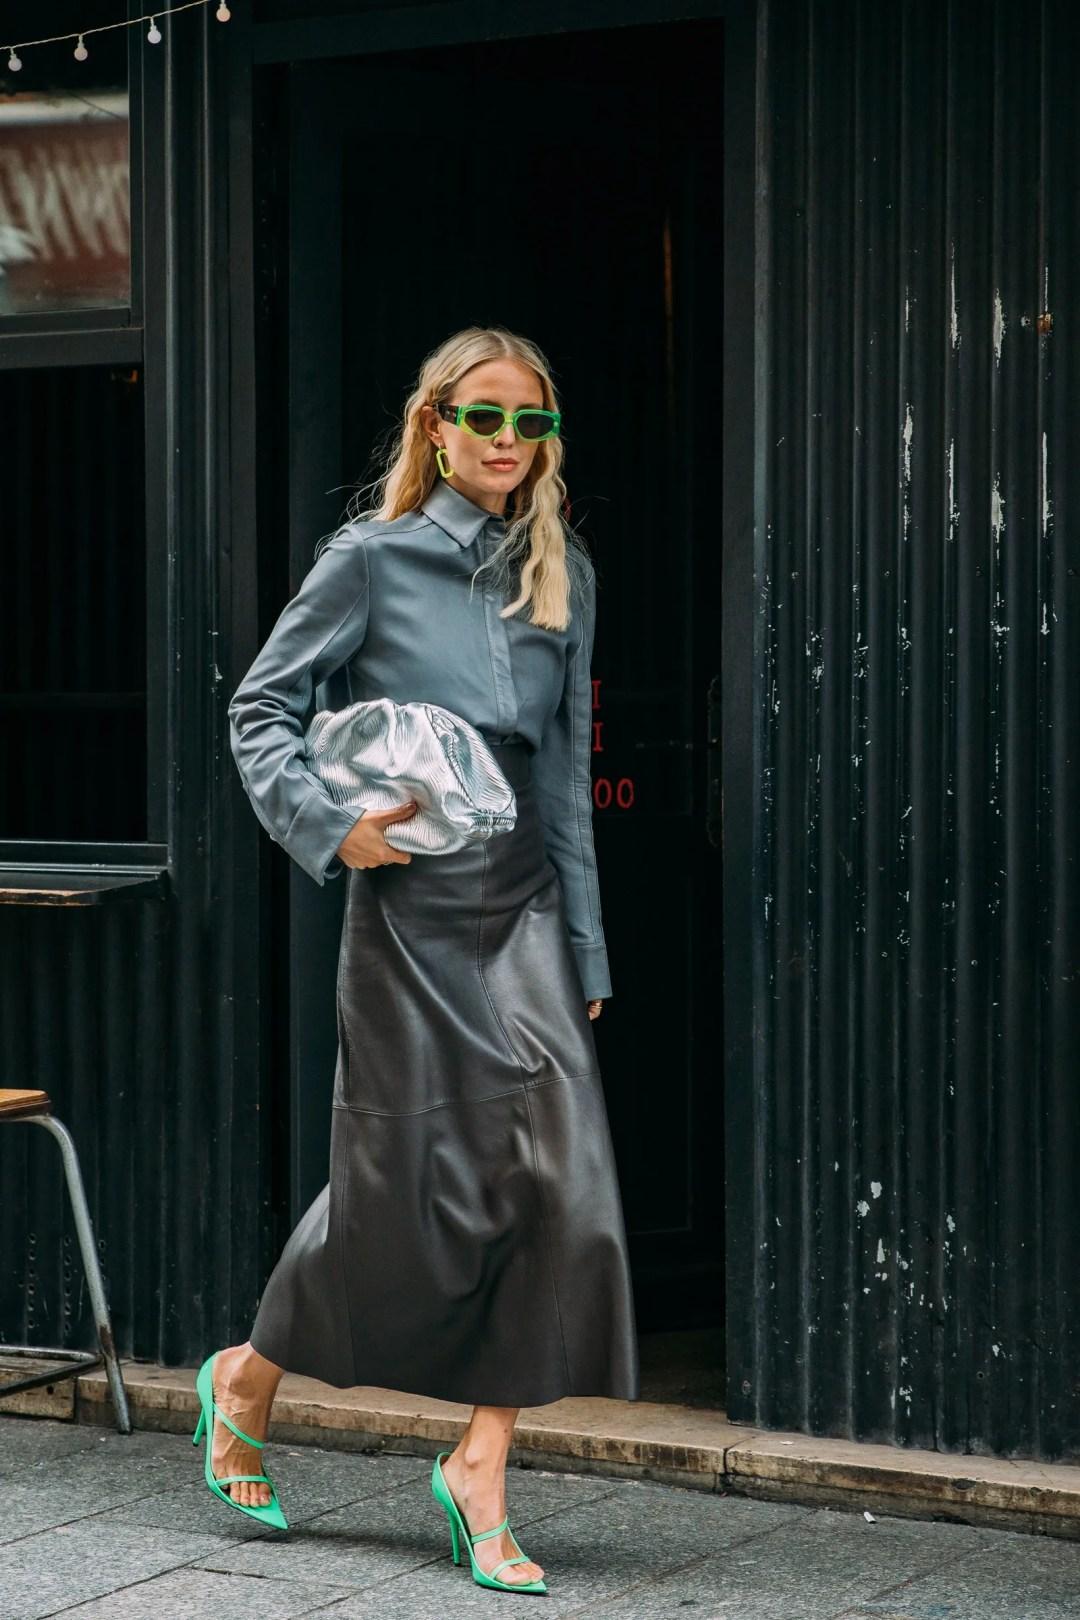 Leonie Hanne carries Bottega Veneta in Paris.